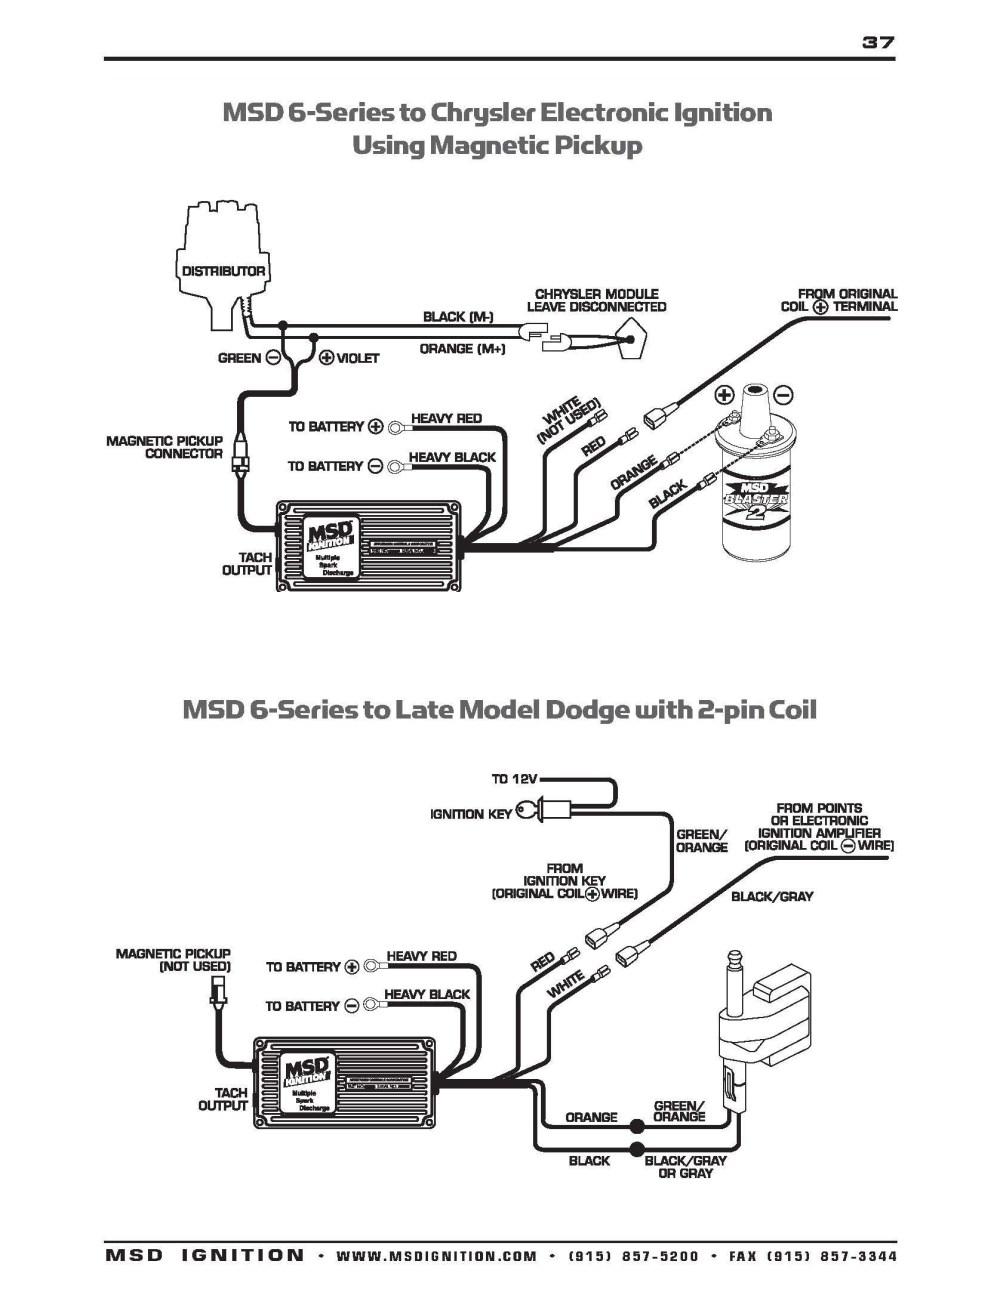 medium resolution of duraspark 2 wiring diagram new 6401 msd ignition wiring diagram ford wiring diagram duraspark 2